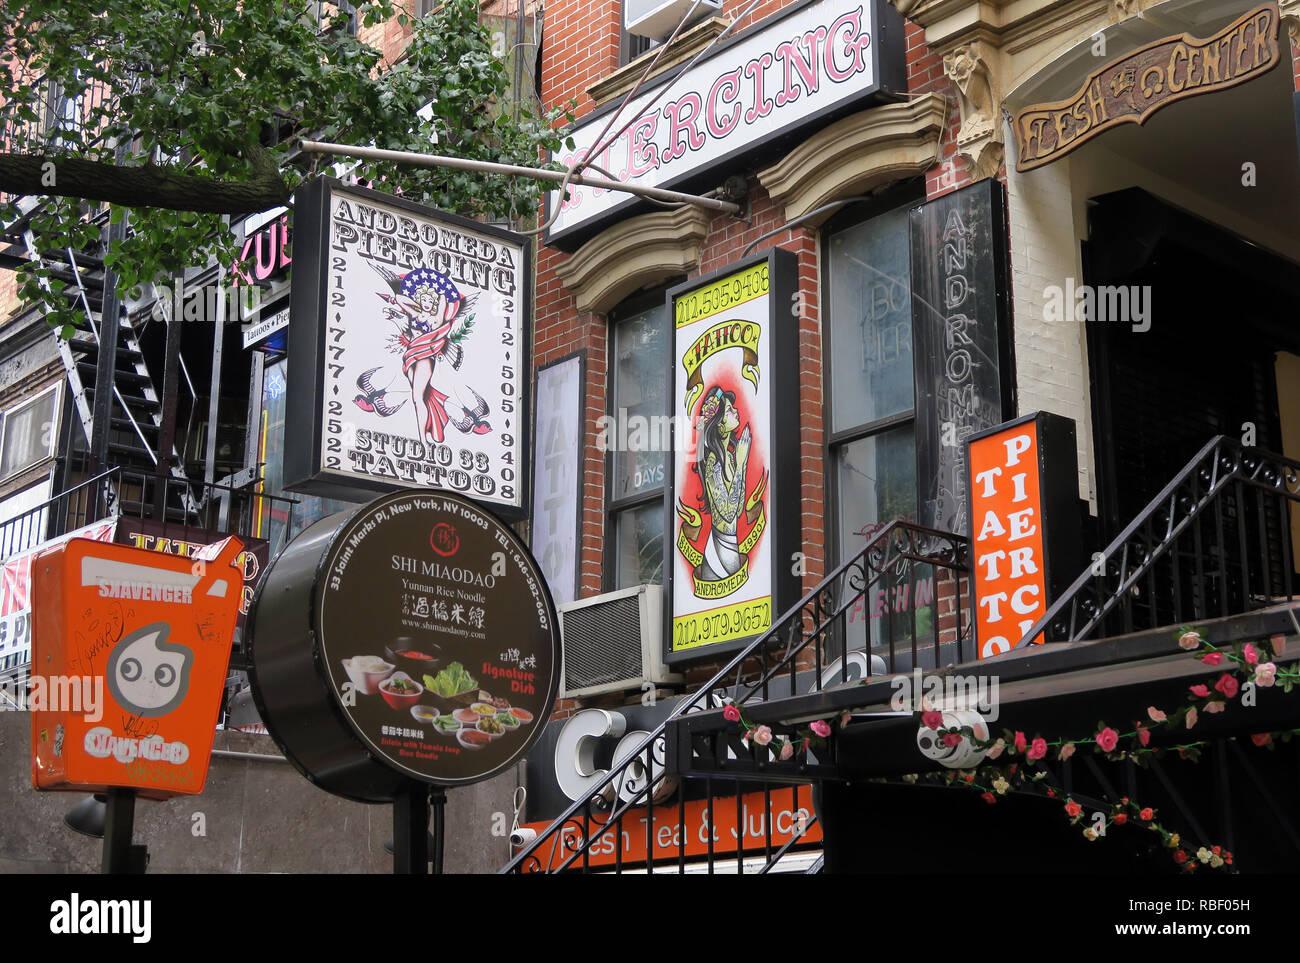 GoTonySmith,@HotpixUK,HotpixUK,NOHO NYC,NYC,New York City,St Marks Place,St Marks Place NYC,street,New York Street,USA,America,City Centre,city,centre,center,city center,East Village,Eastvillage,New York Travel Tourism,store,stores,Flesh Center,New York,NY,tattooist,New York city